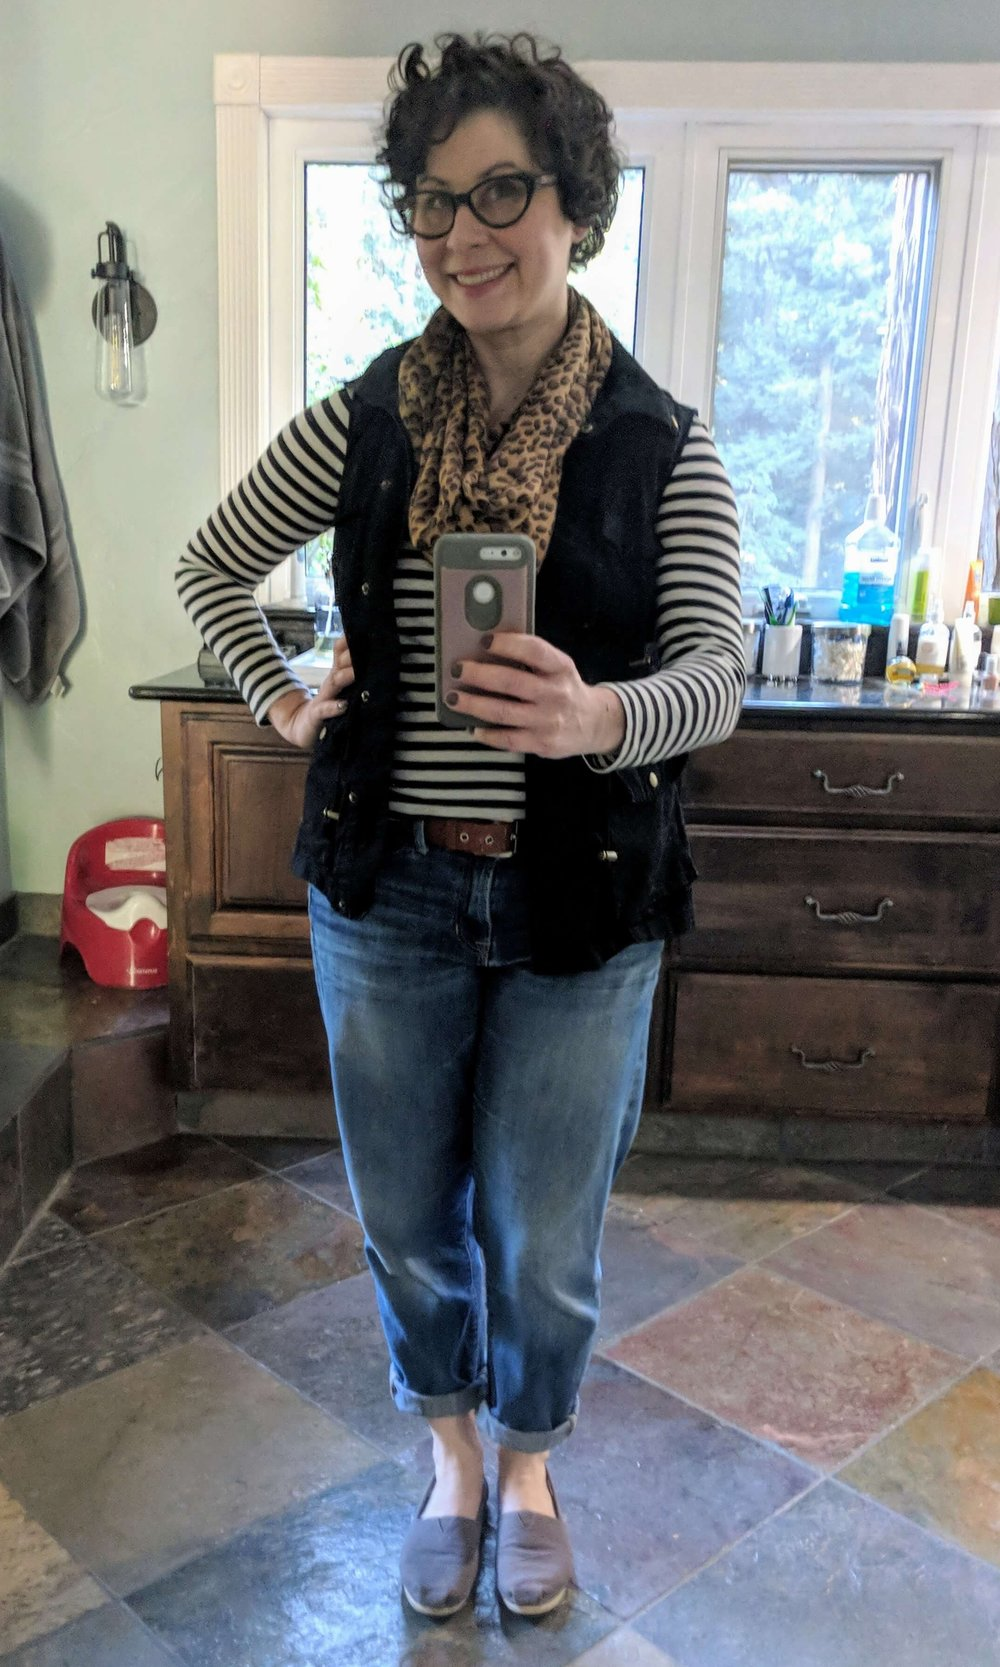 IMG_20181016_093110_2 - Nicole Stallard.jpg